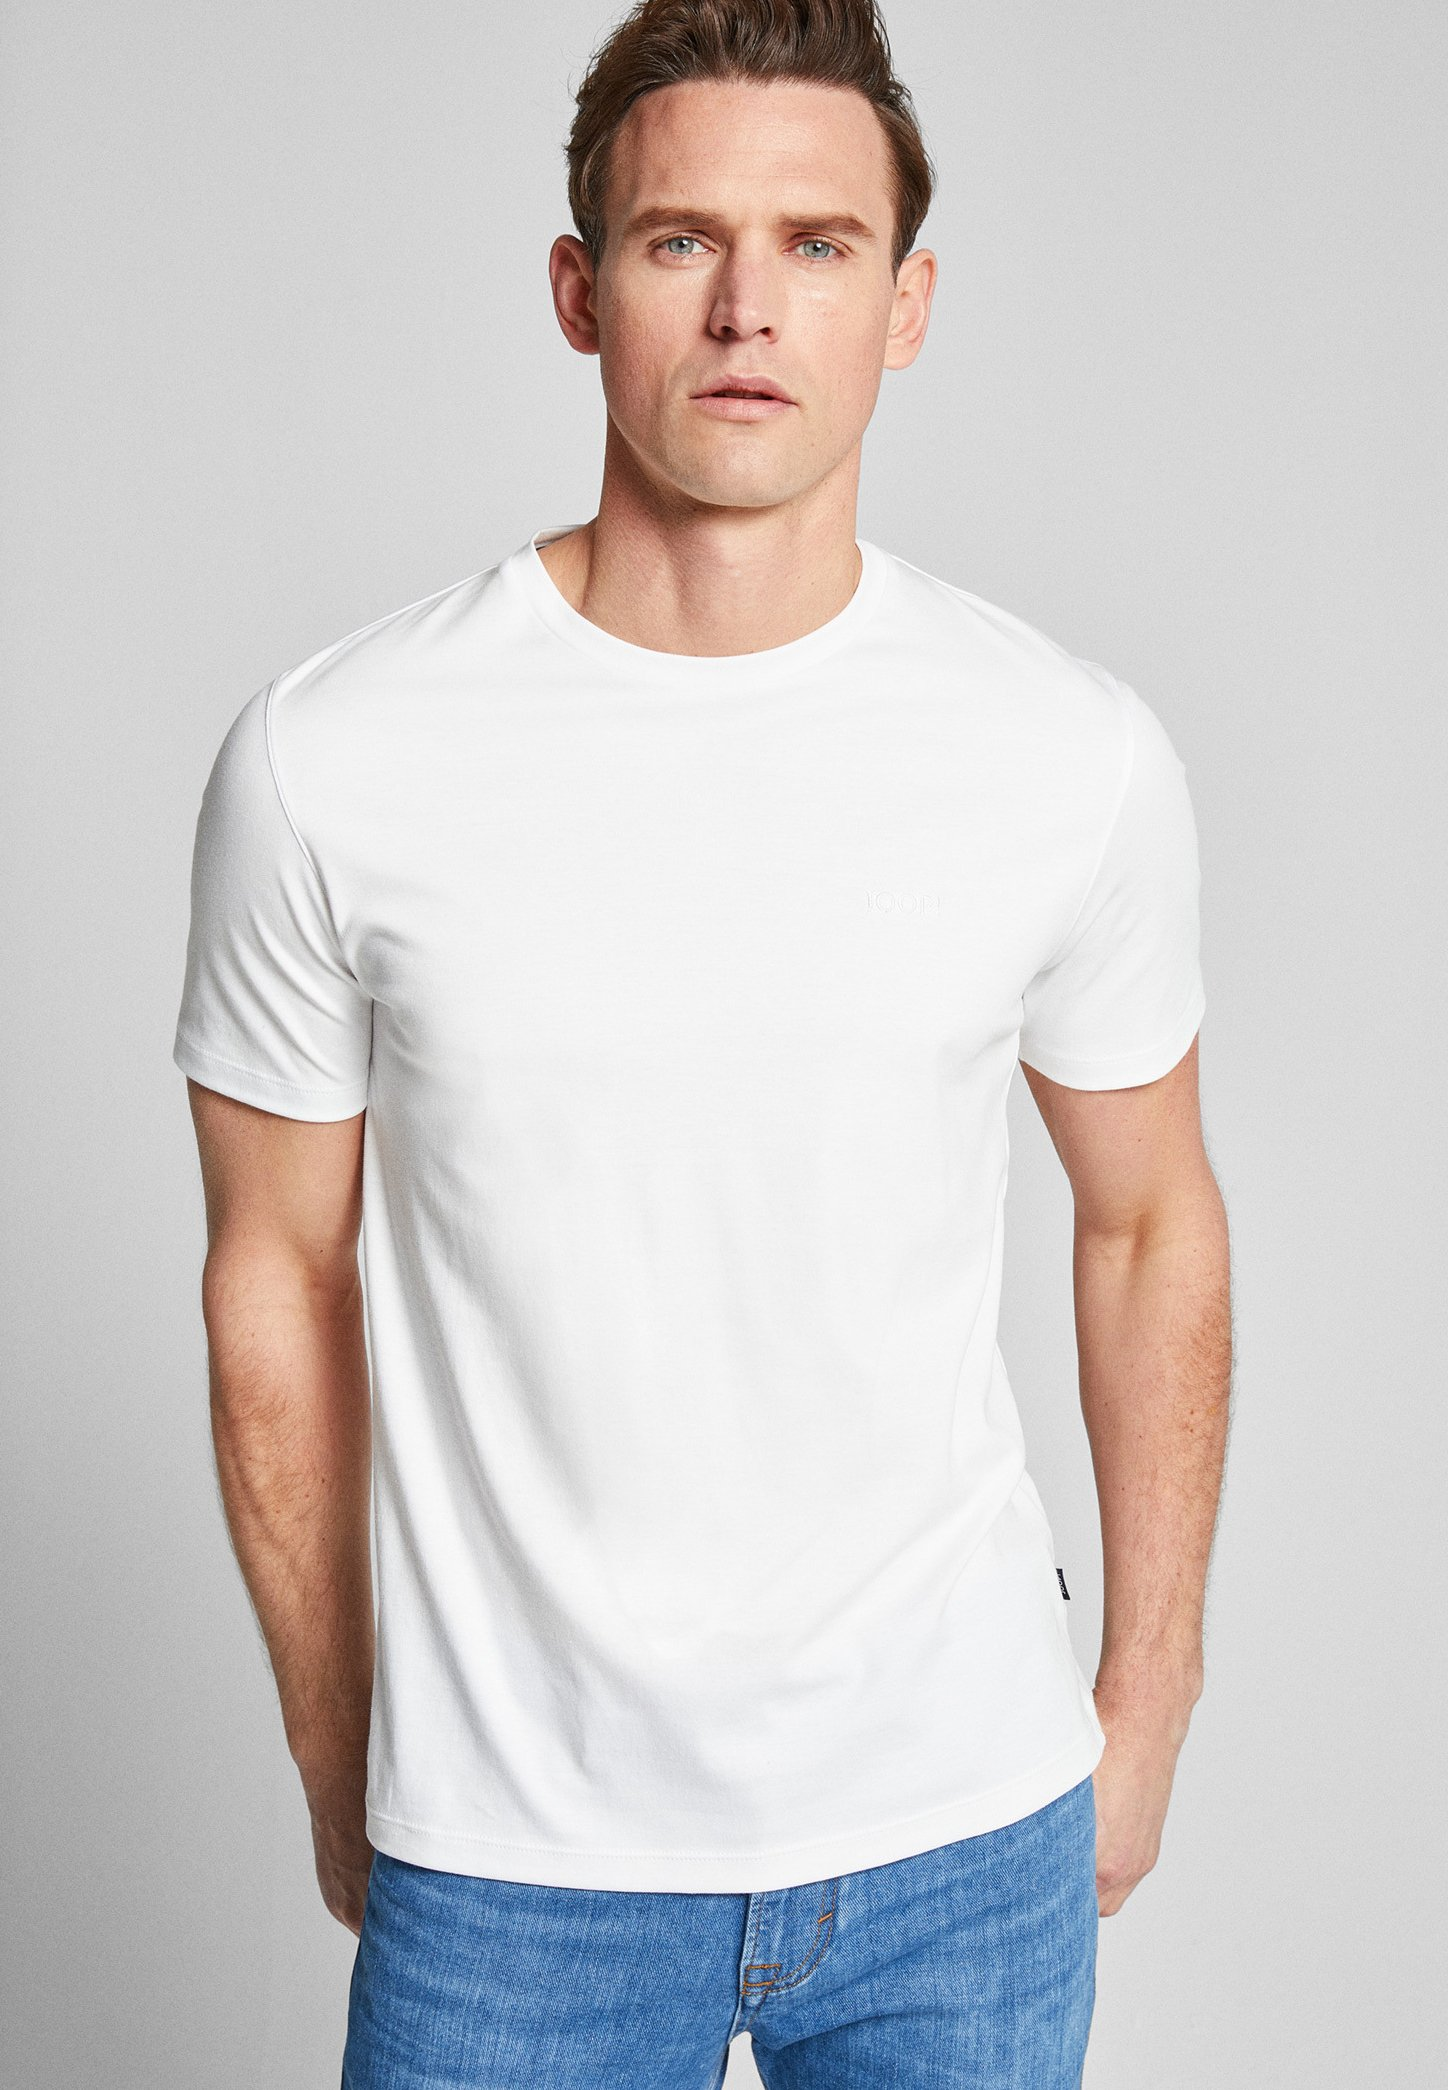 Men CORRADO - Basic T-shirt - white